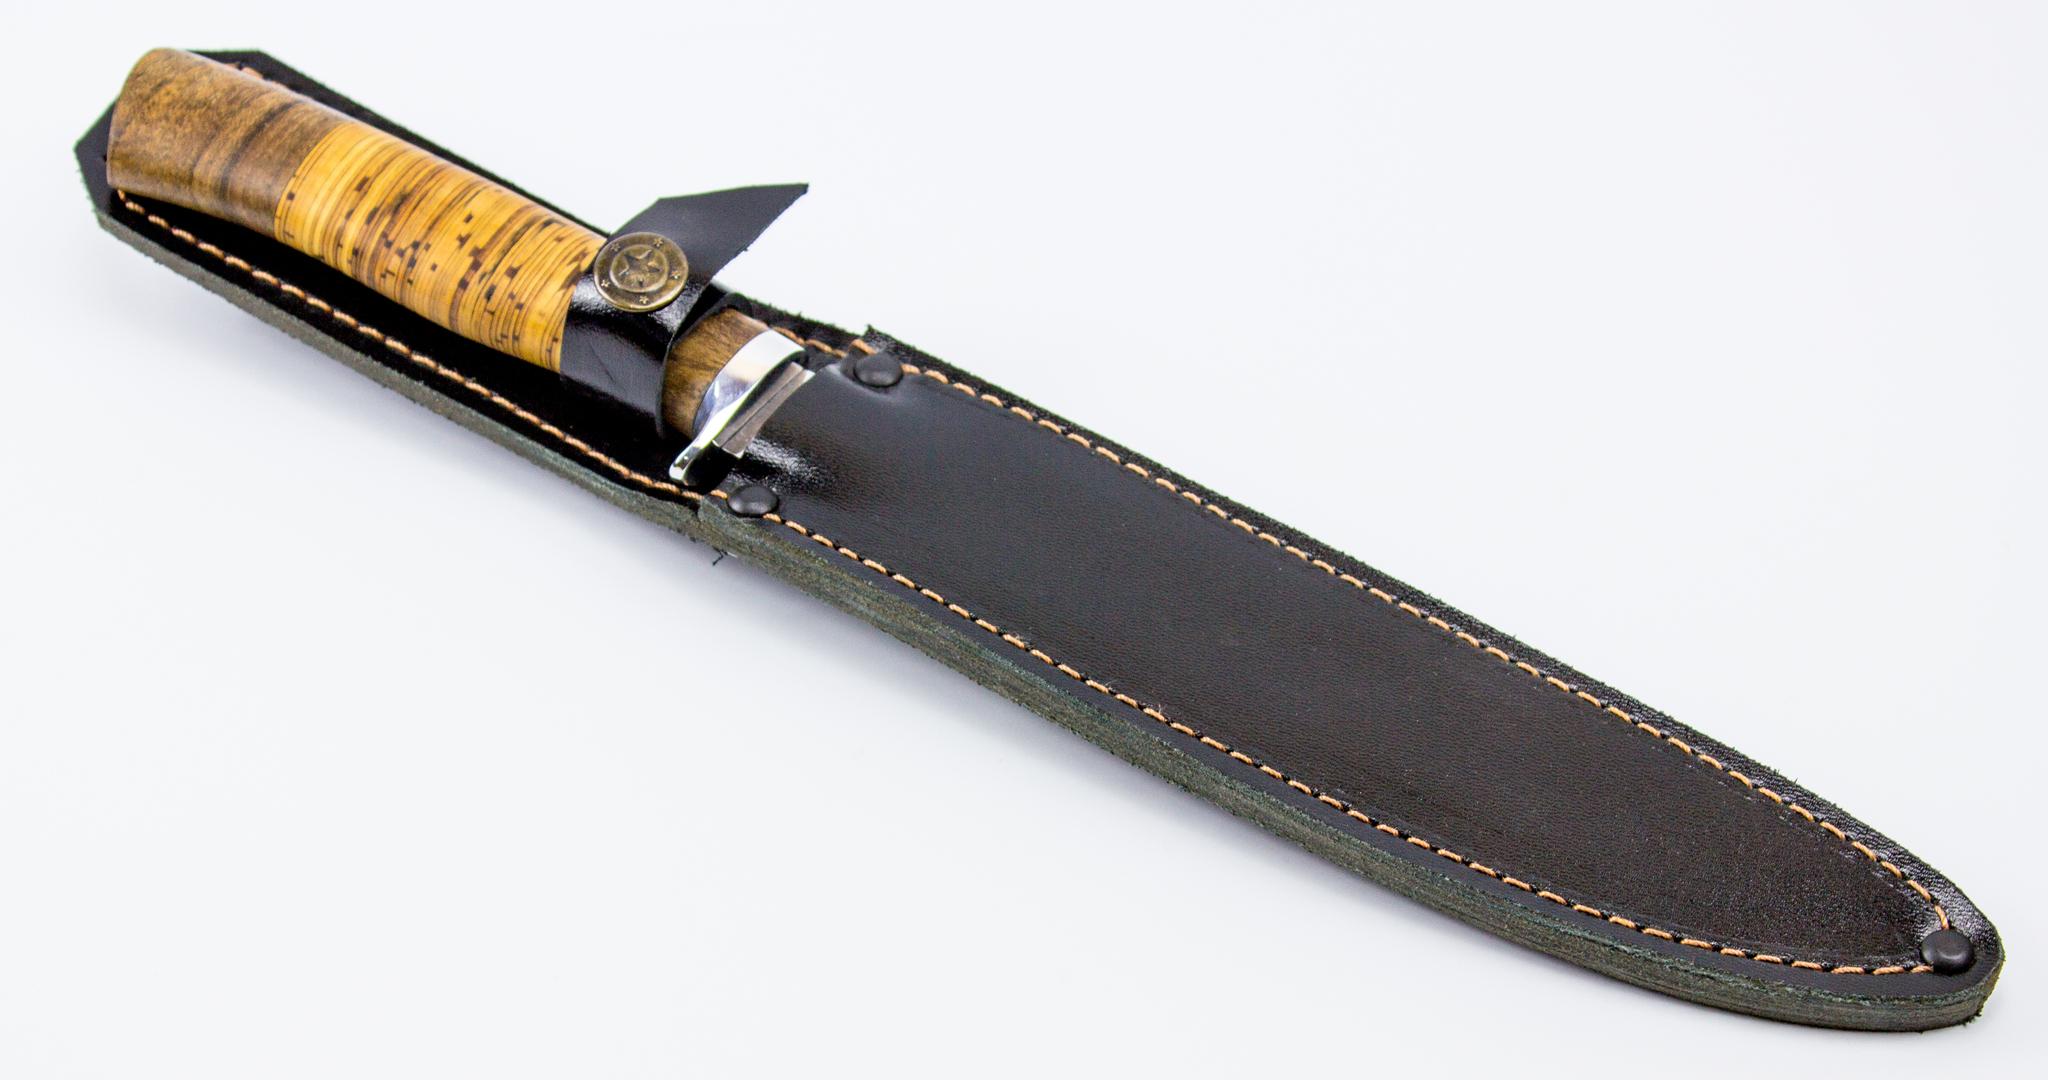 Фото 6 - Нож филейный Нерпа 65х13, береста от Фабрика Баринова